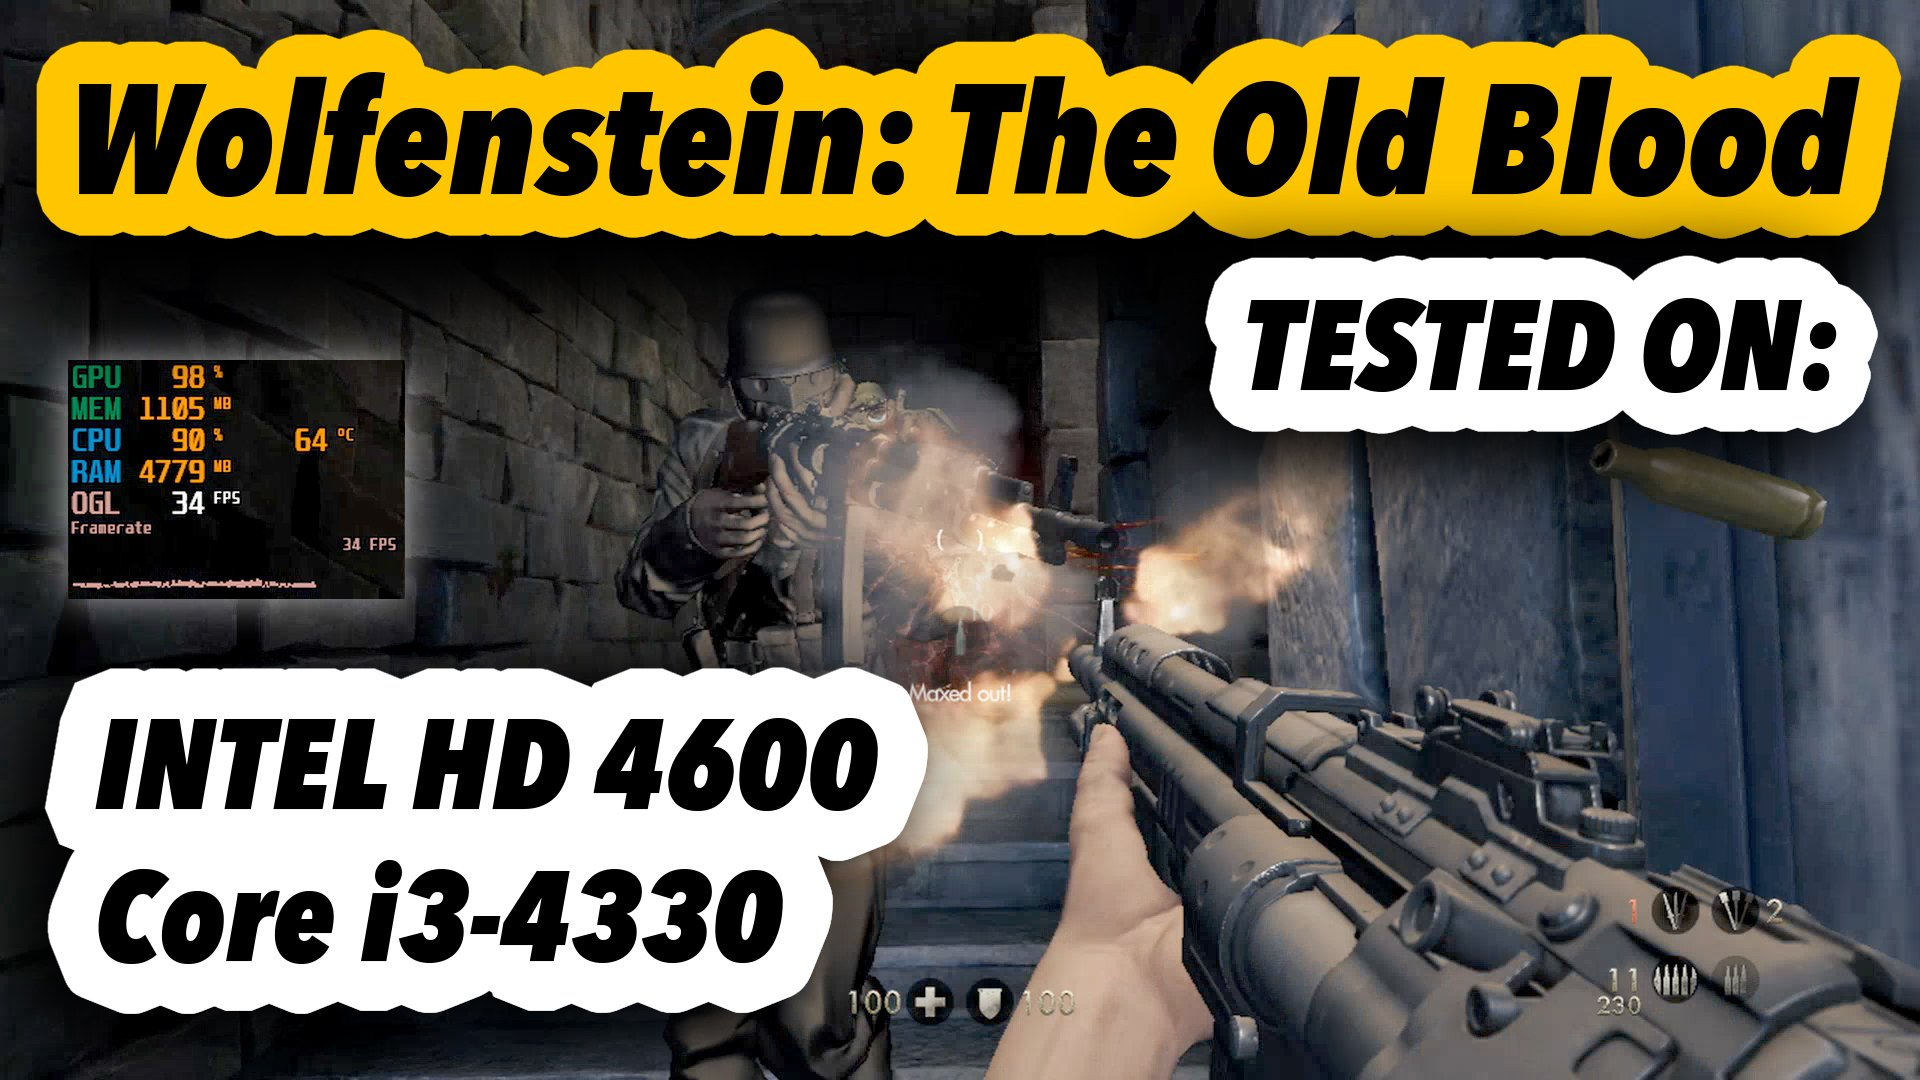 Wolfenstein: The Old Blood | Intel Core i3-4330 + Intel HD4600 | Test Gameplay